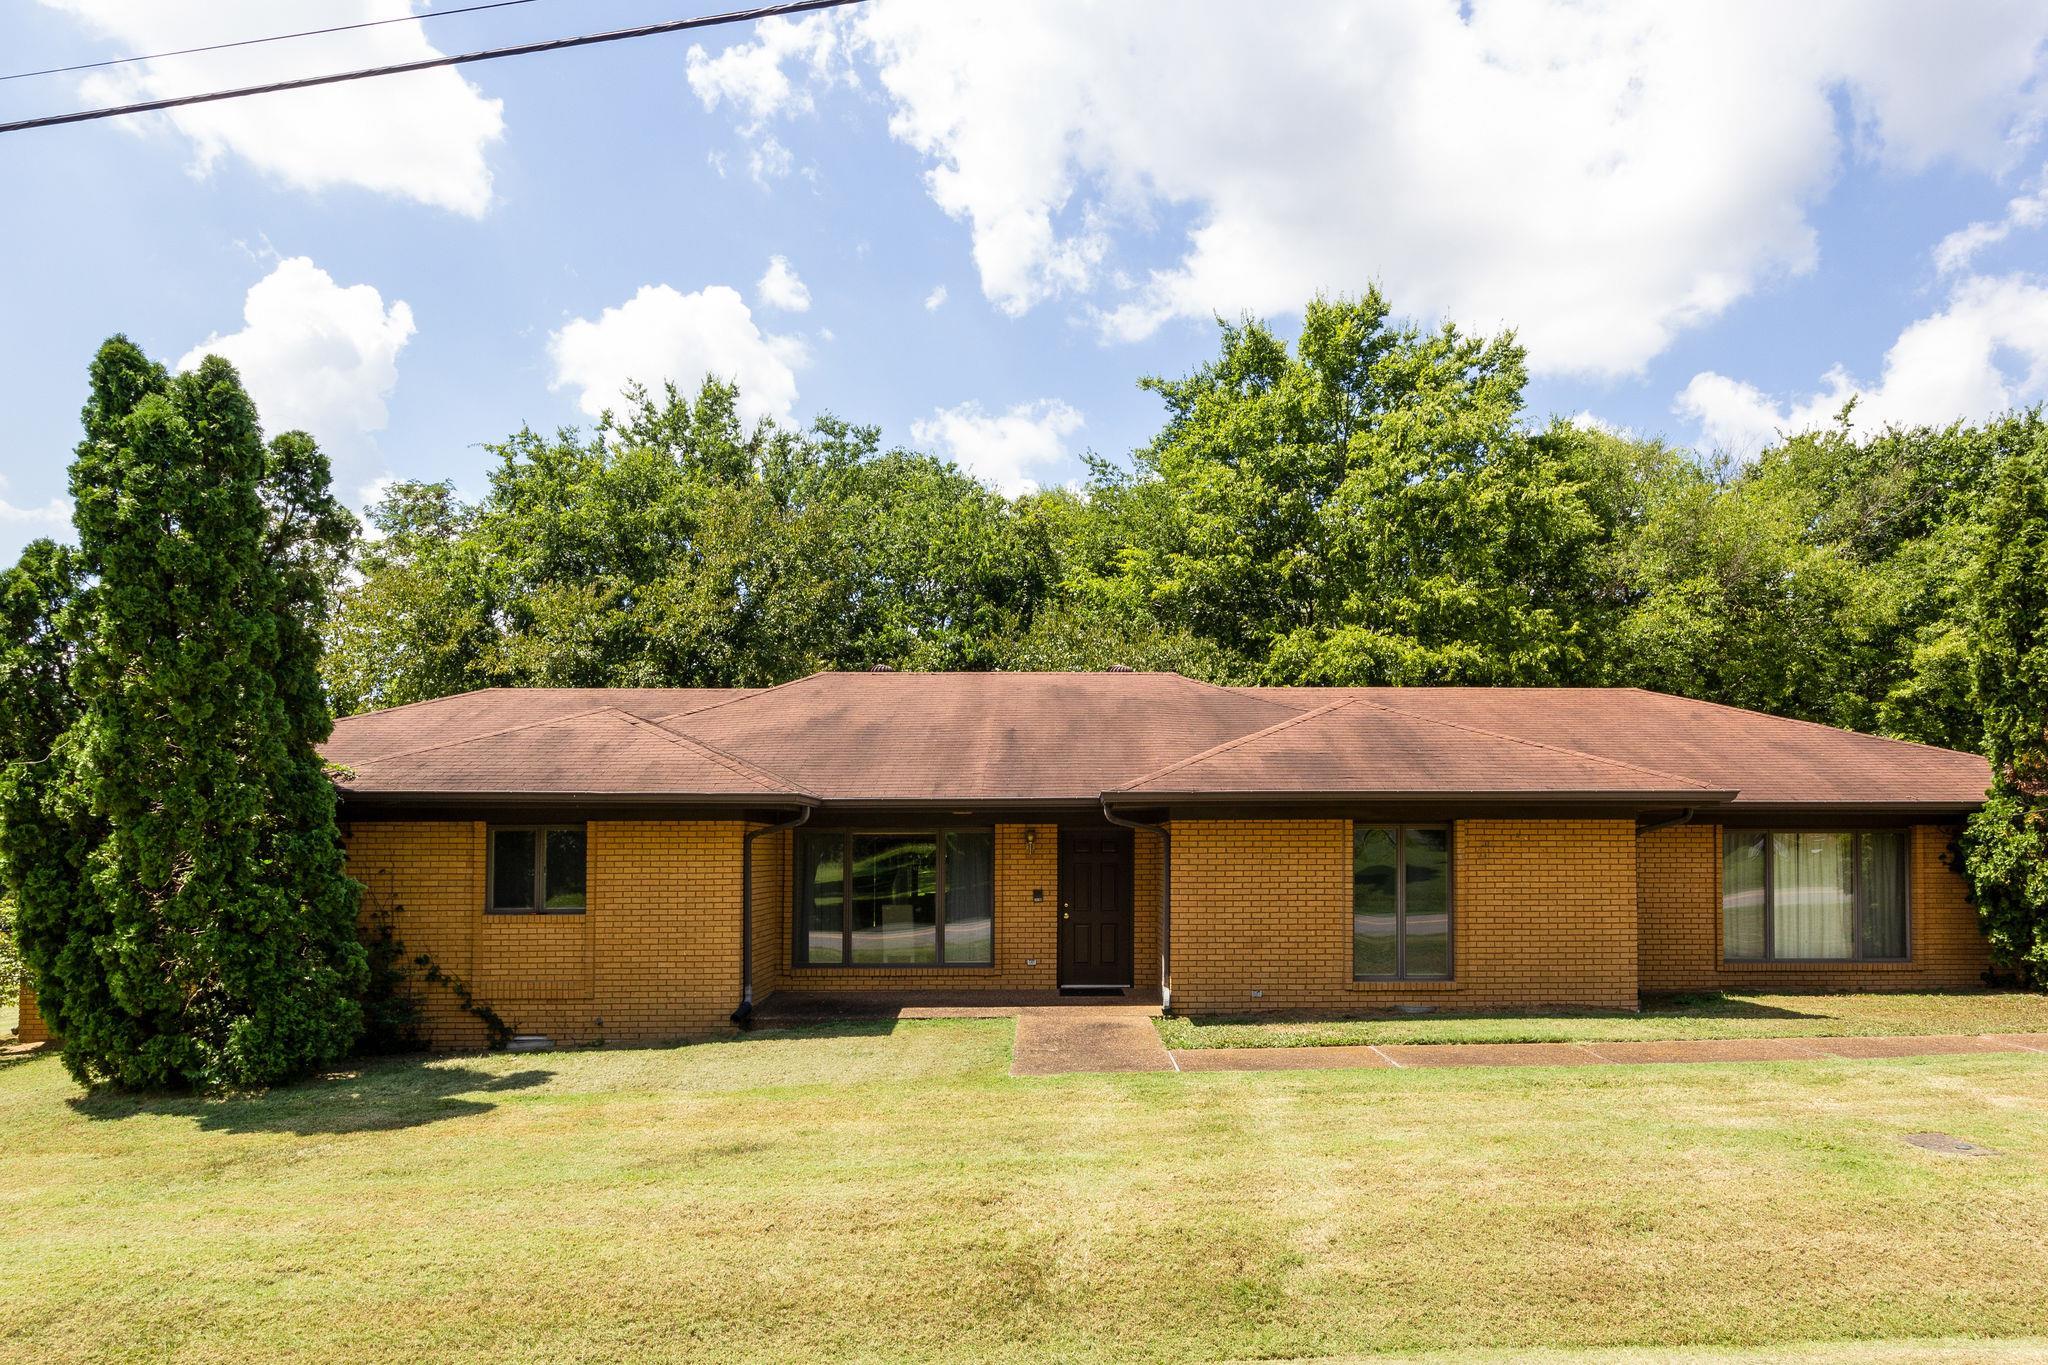 3973 Drakes Branch Rd, Nashville, TN 37218 - Nashville, TN real estate listing